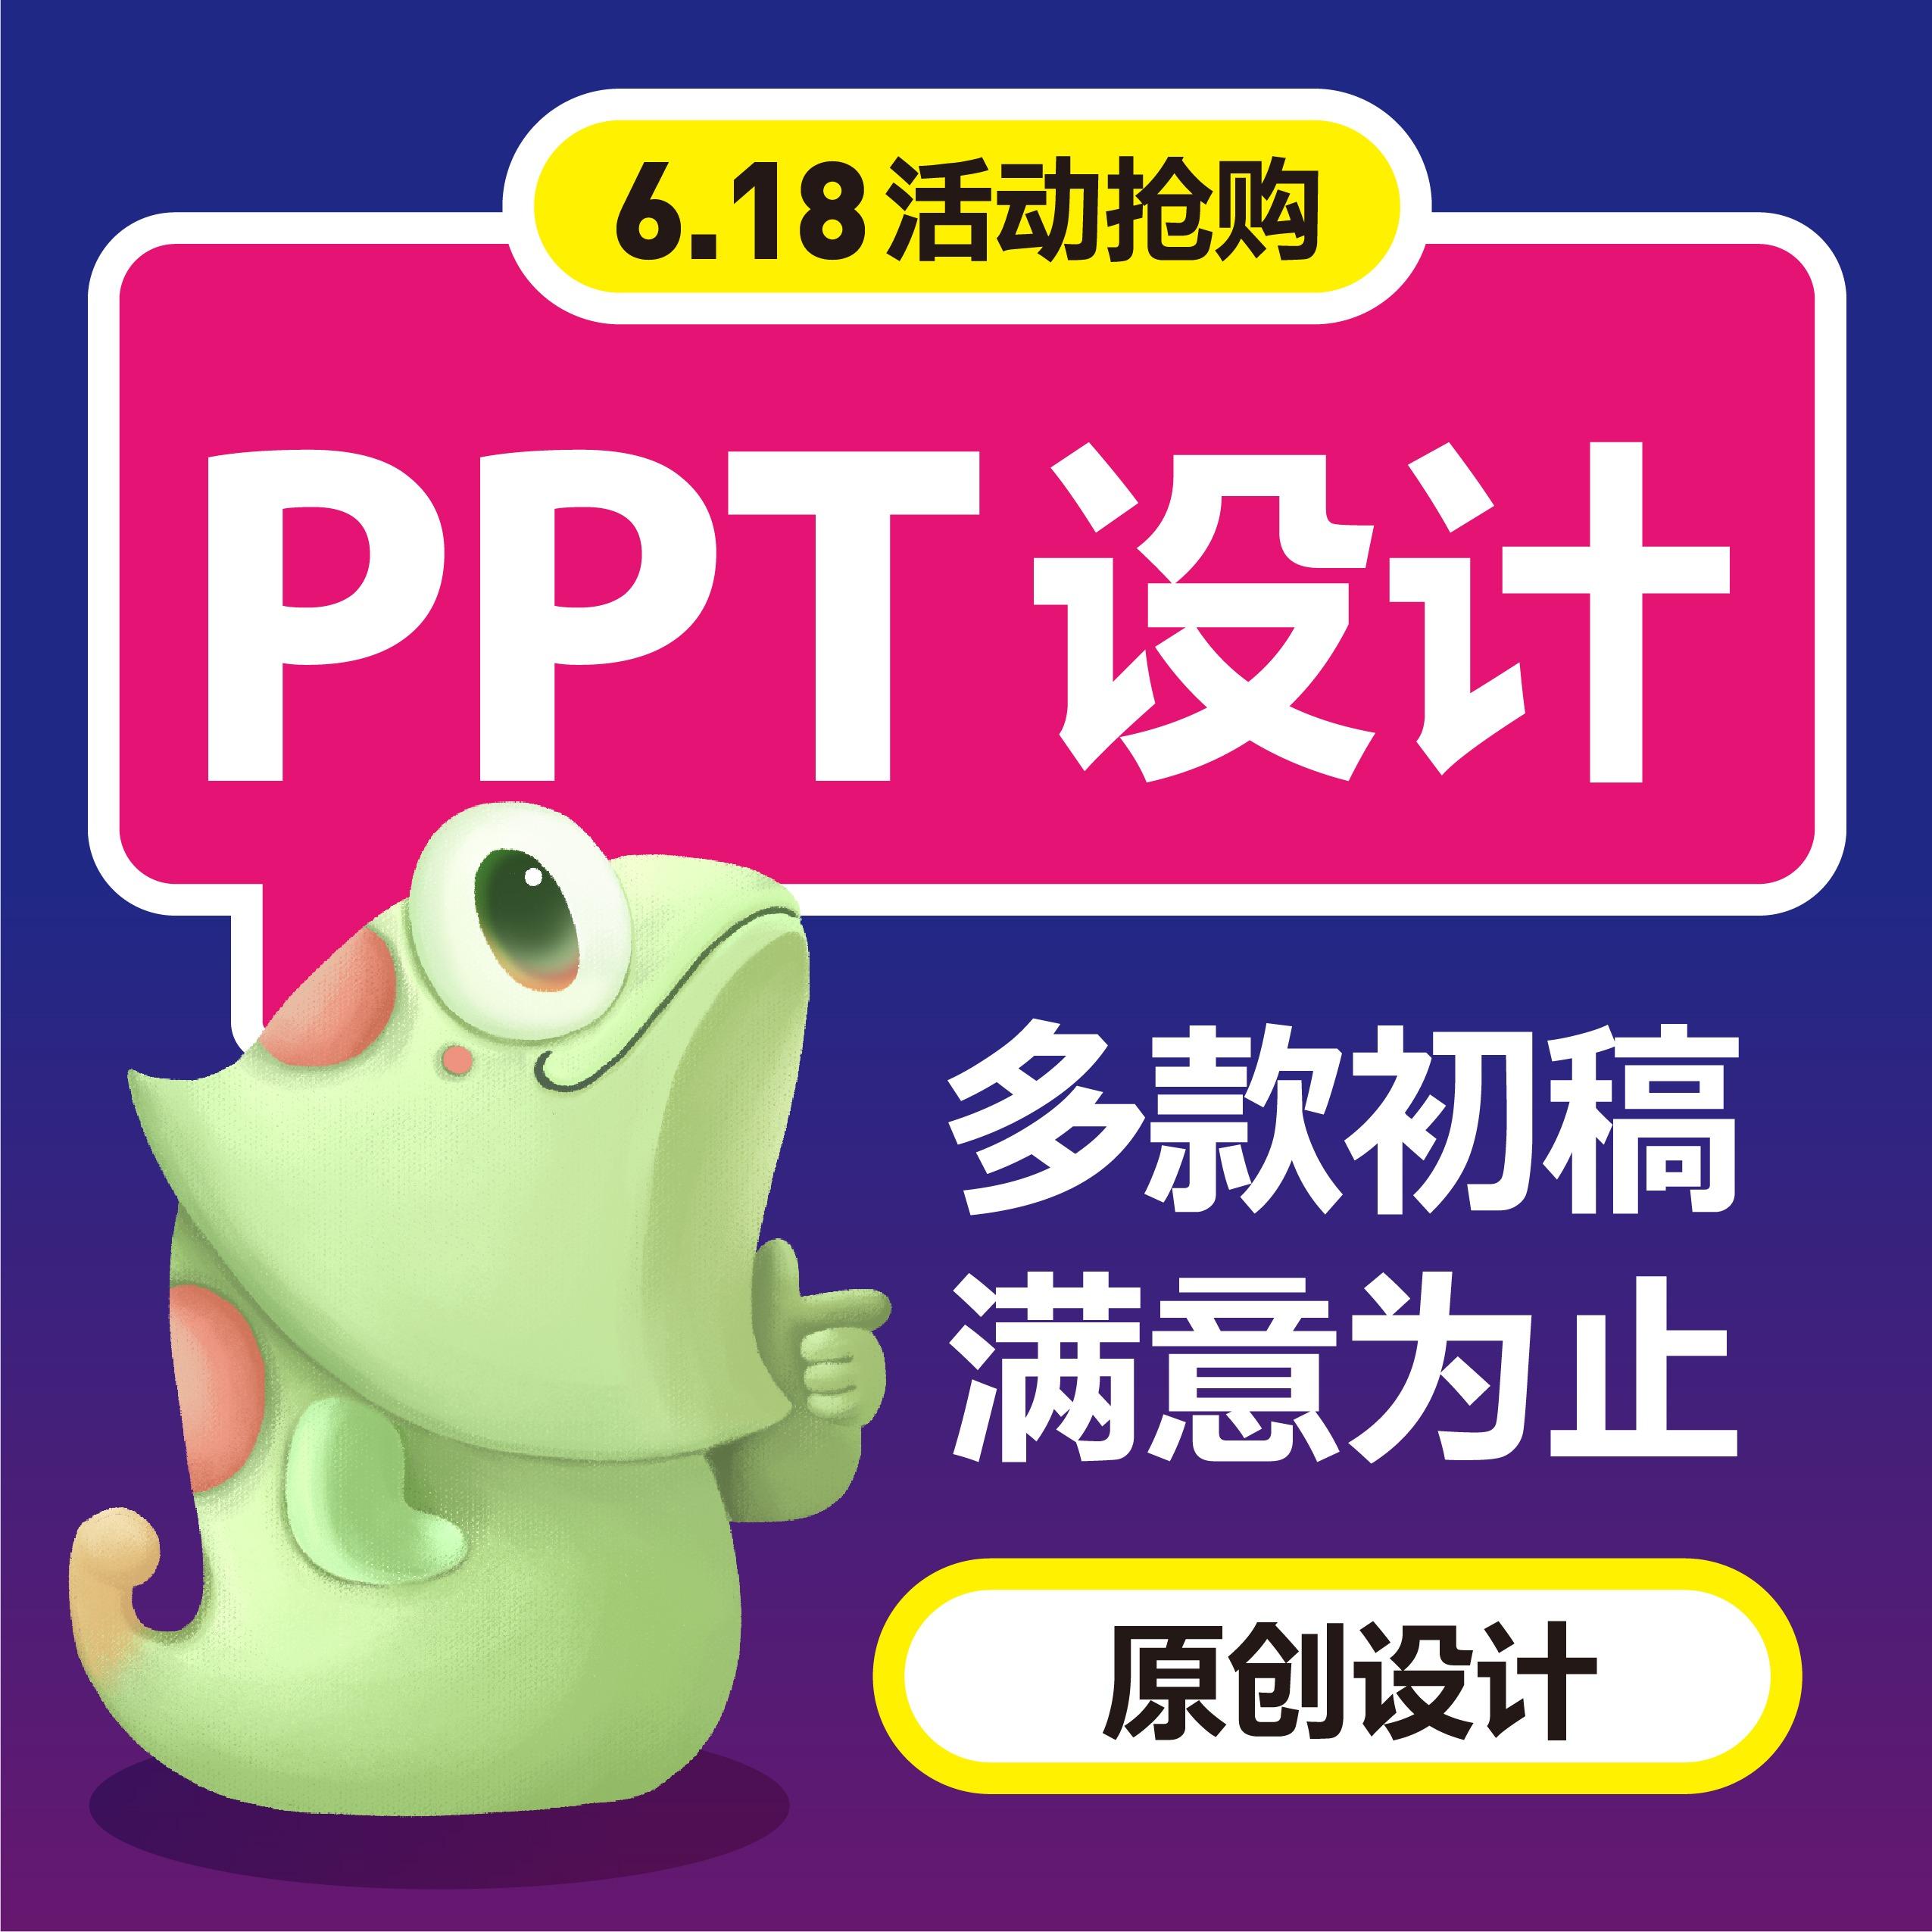 ppt 设计 PPT 制作 ppt 美化 PPT 发布会路演招商汇报课件